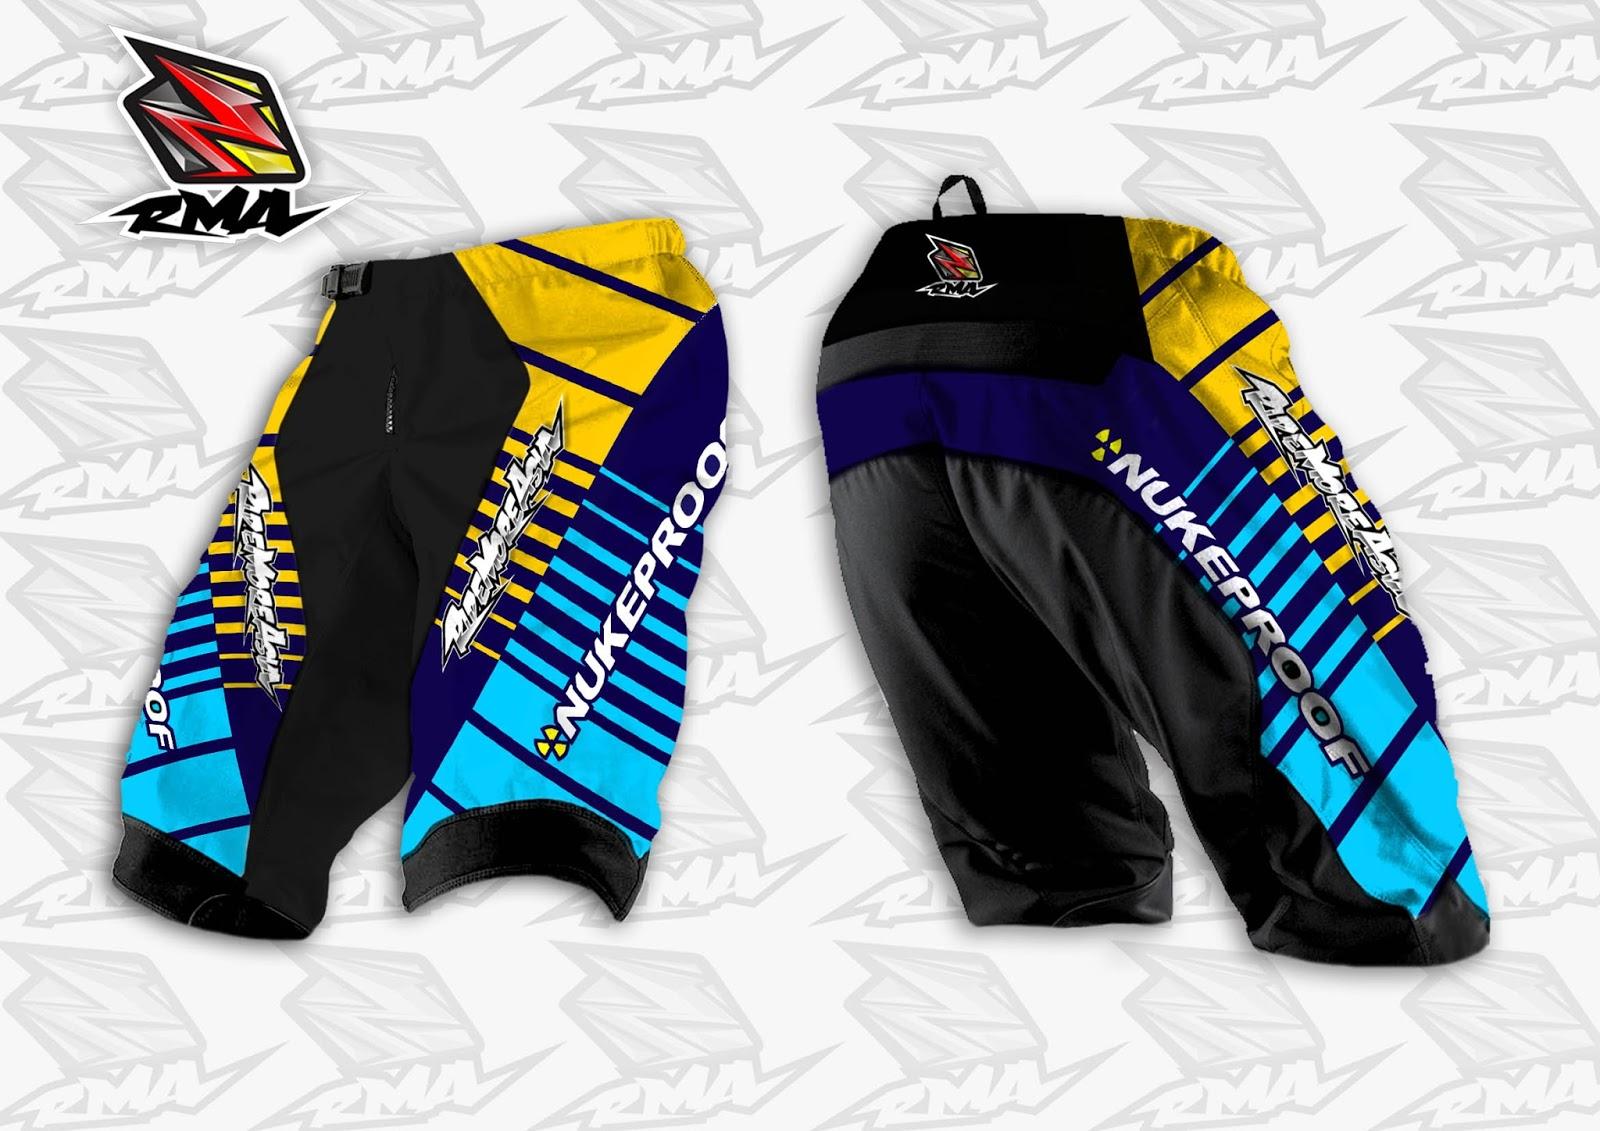 Jual Jersey (Baju/Pakaian) Sepeda, Motocross, Trail...dll